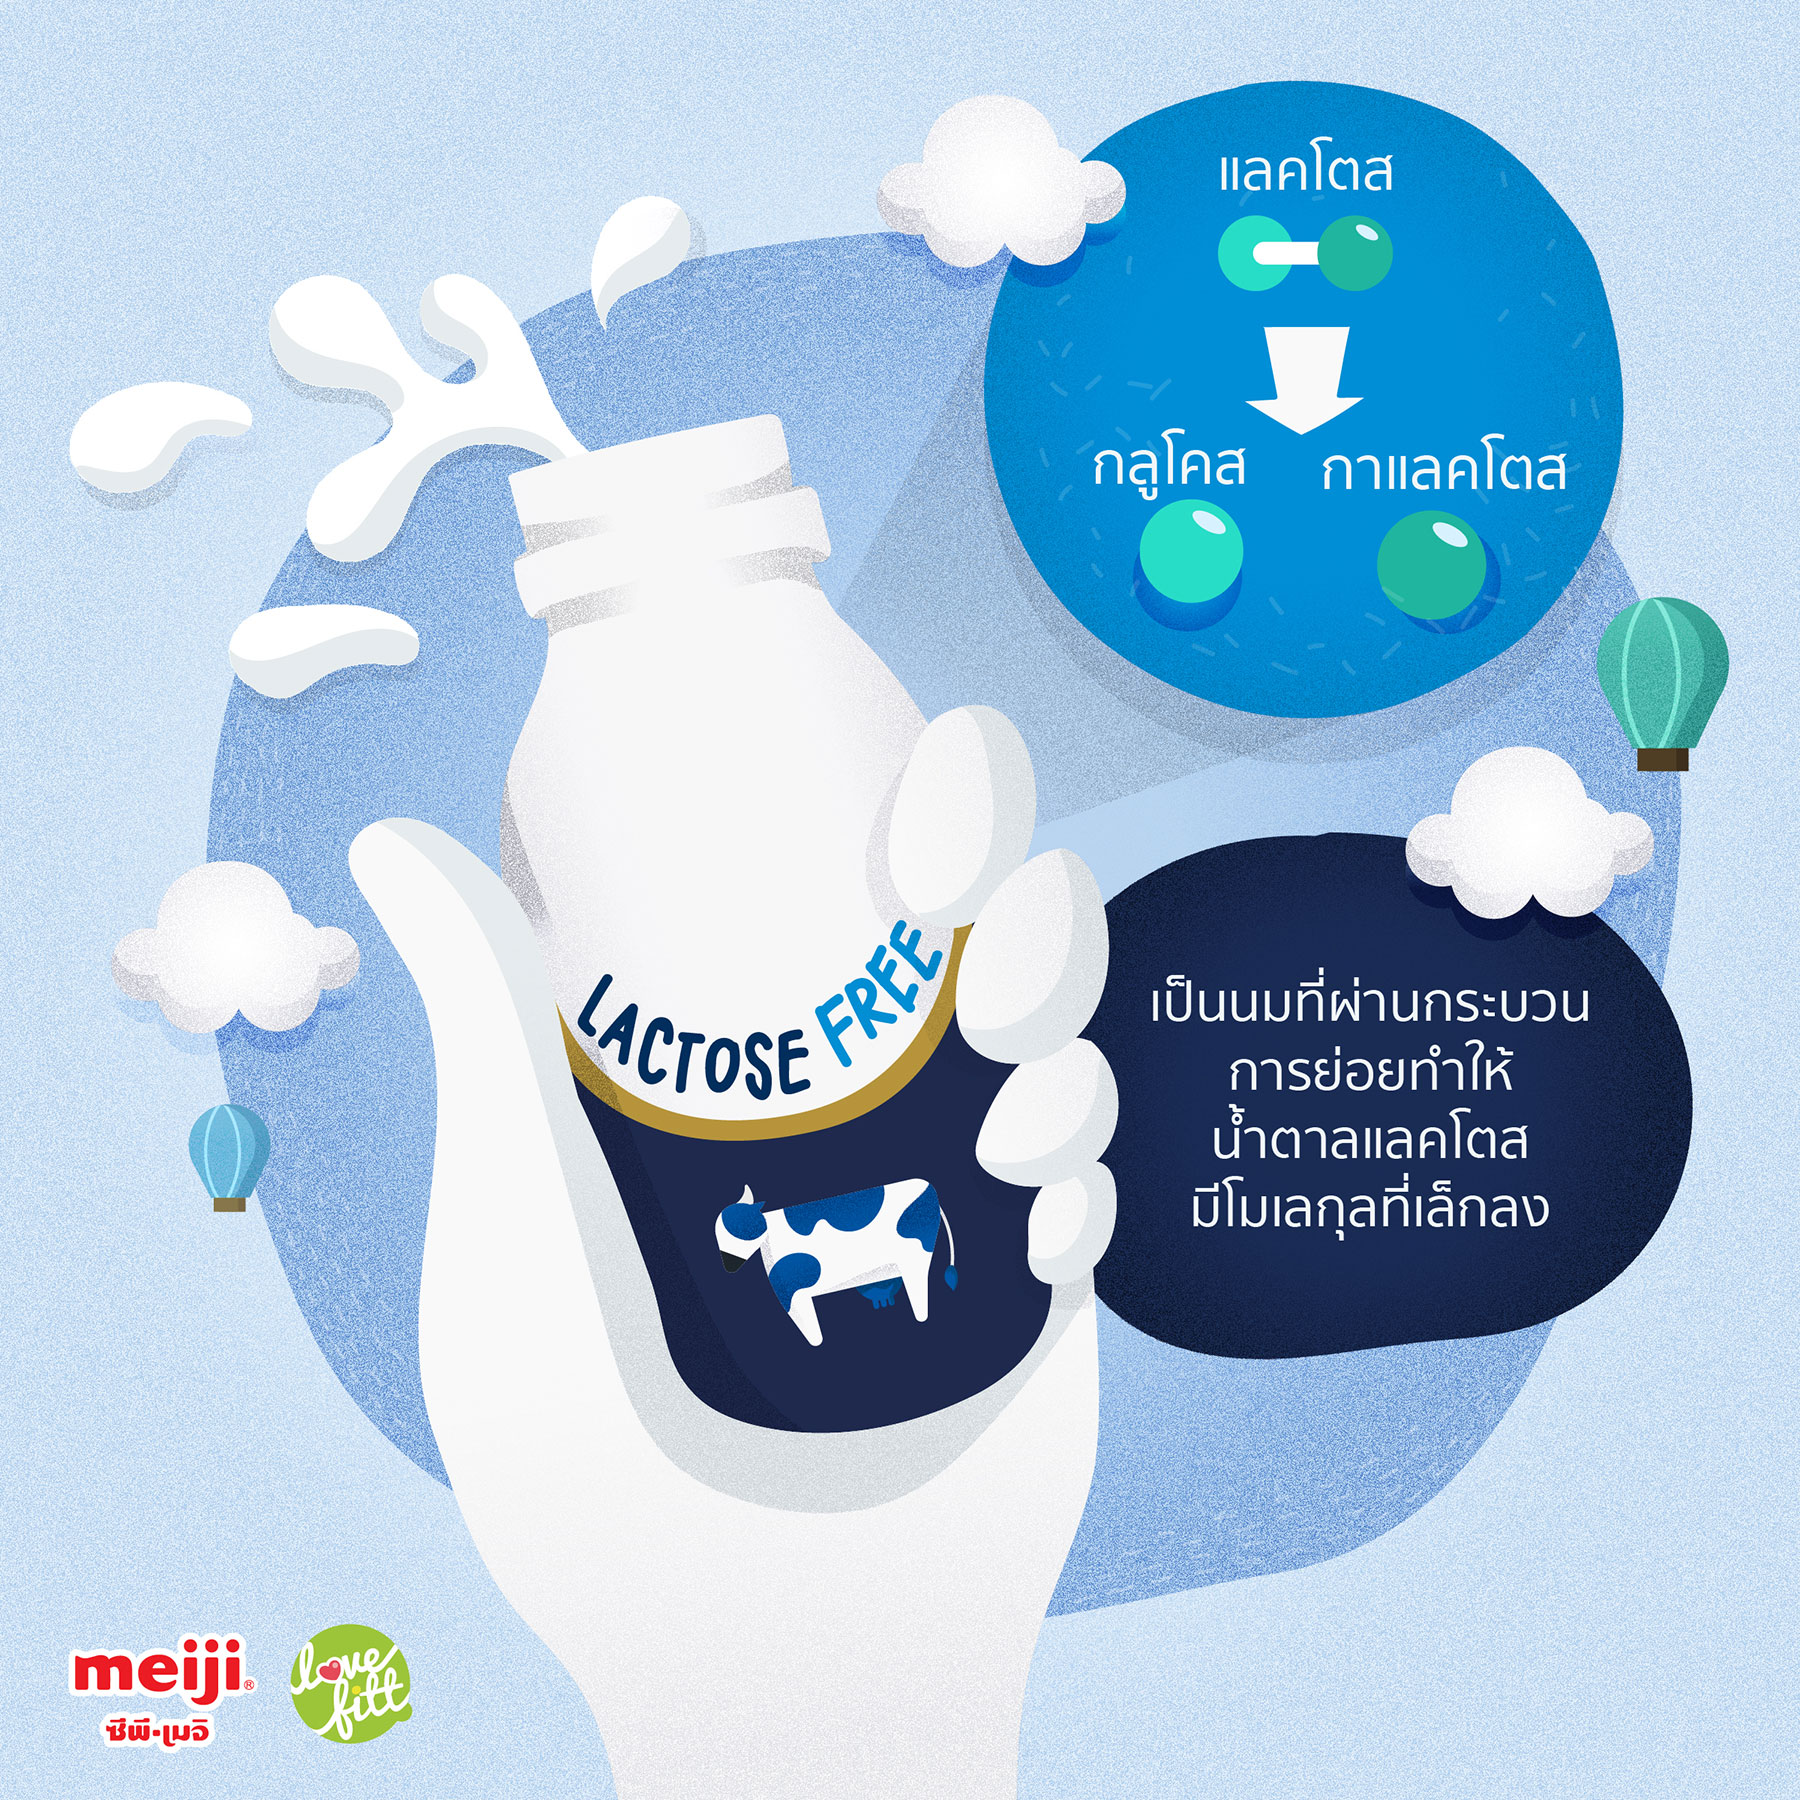 meiji-lactose-free-milk-img-07